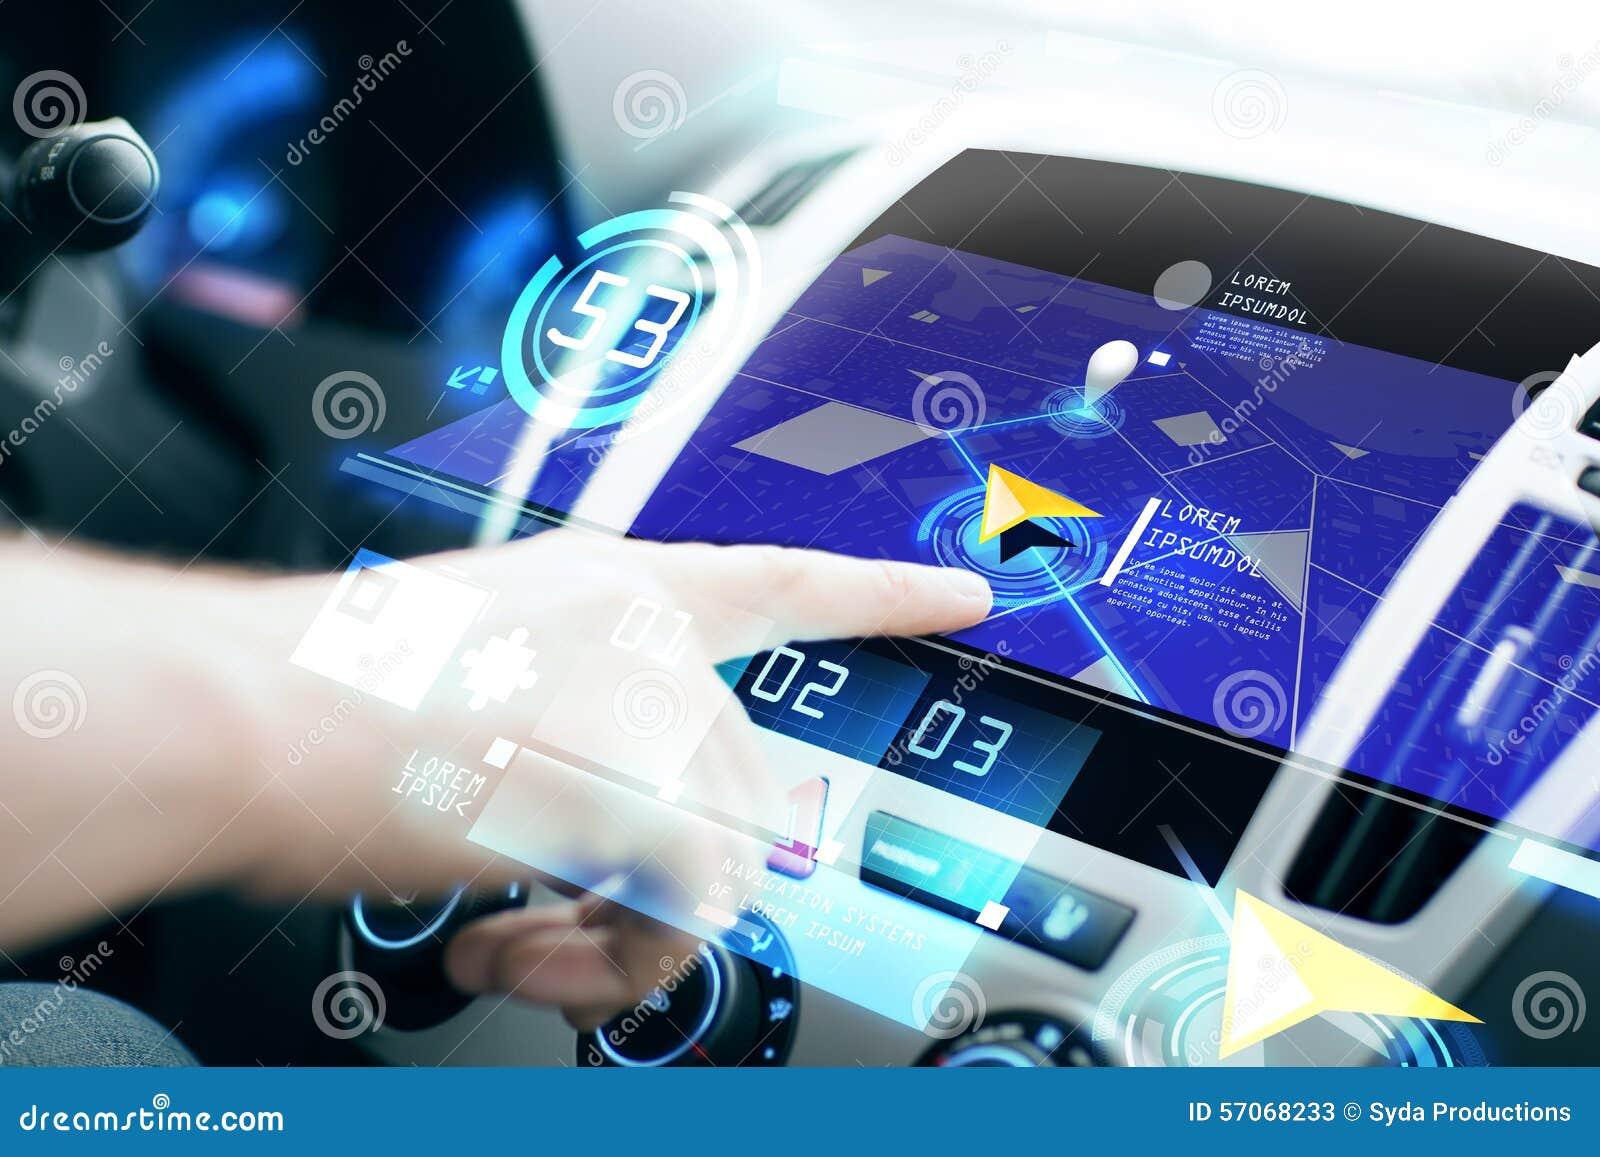 Car Dashboard Diagram Your Crownvic39s Dashboard